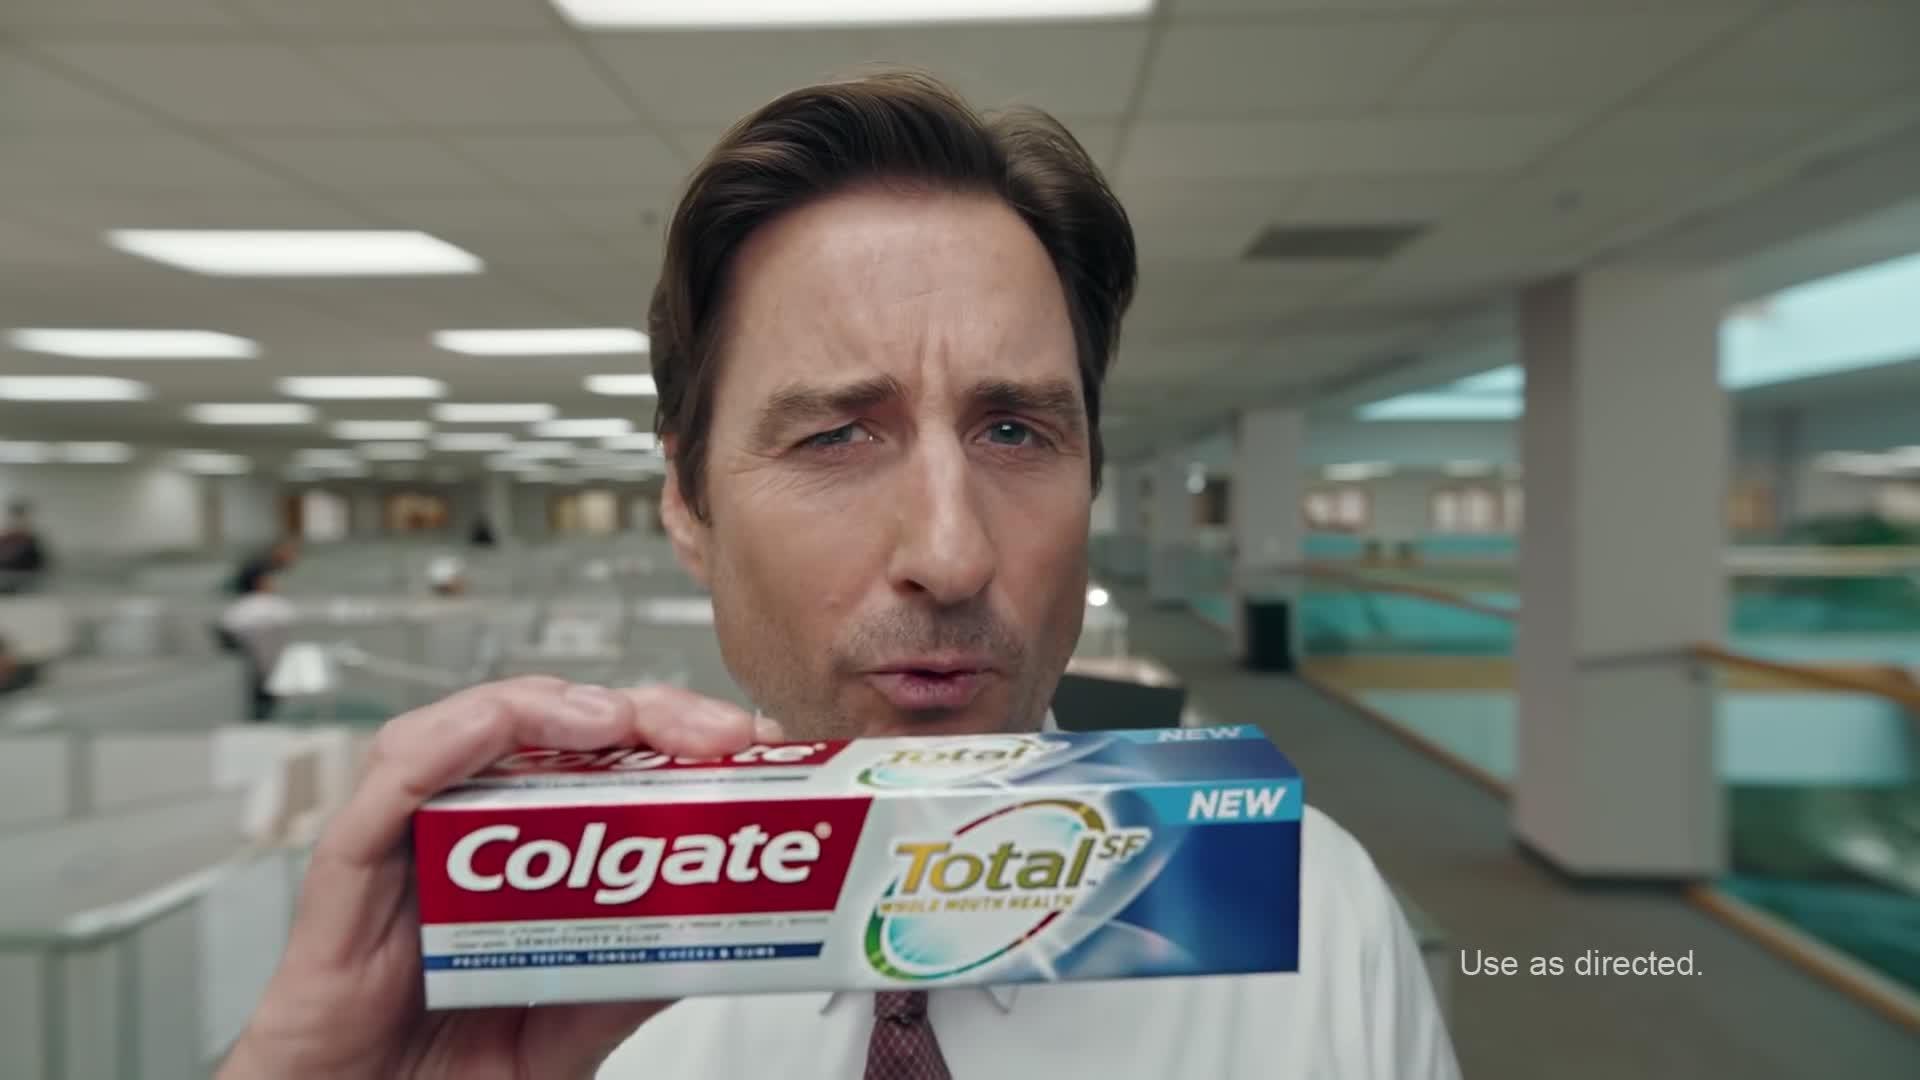 Werbung, Werbespot, Super Bowl, Spot, Super Bowl 2019, Colgate